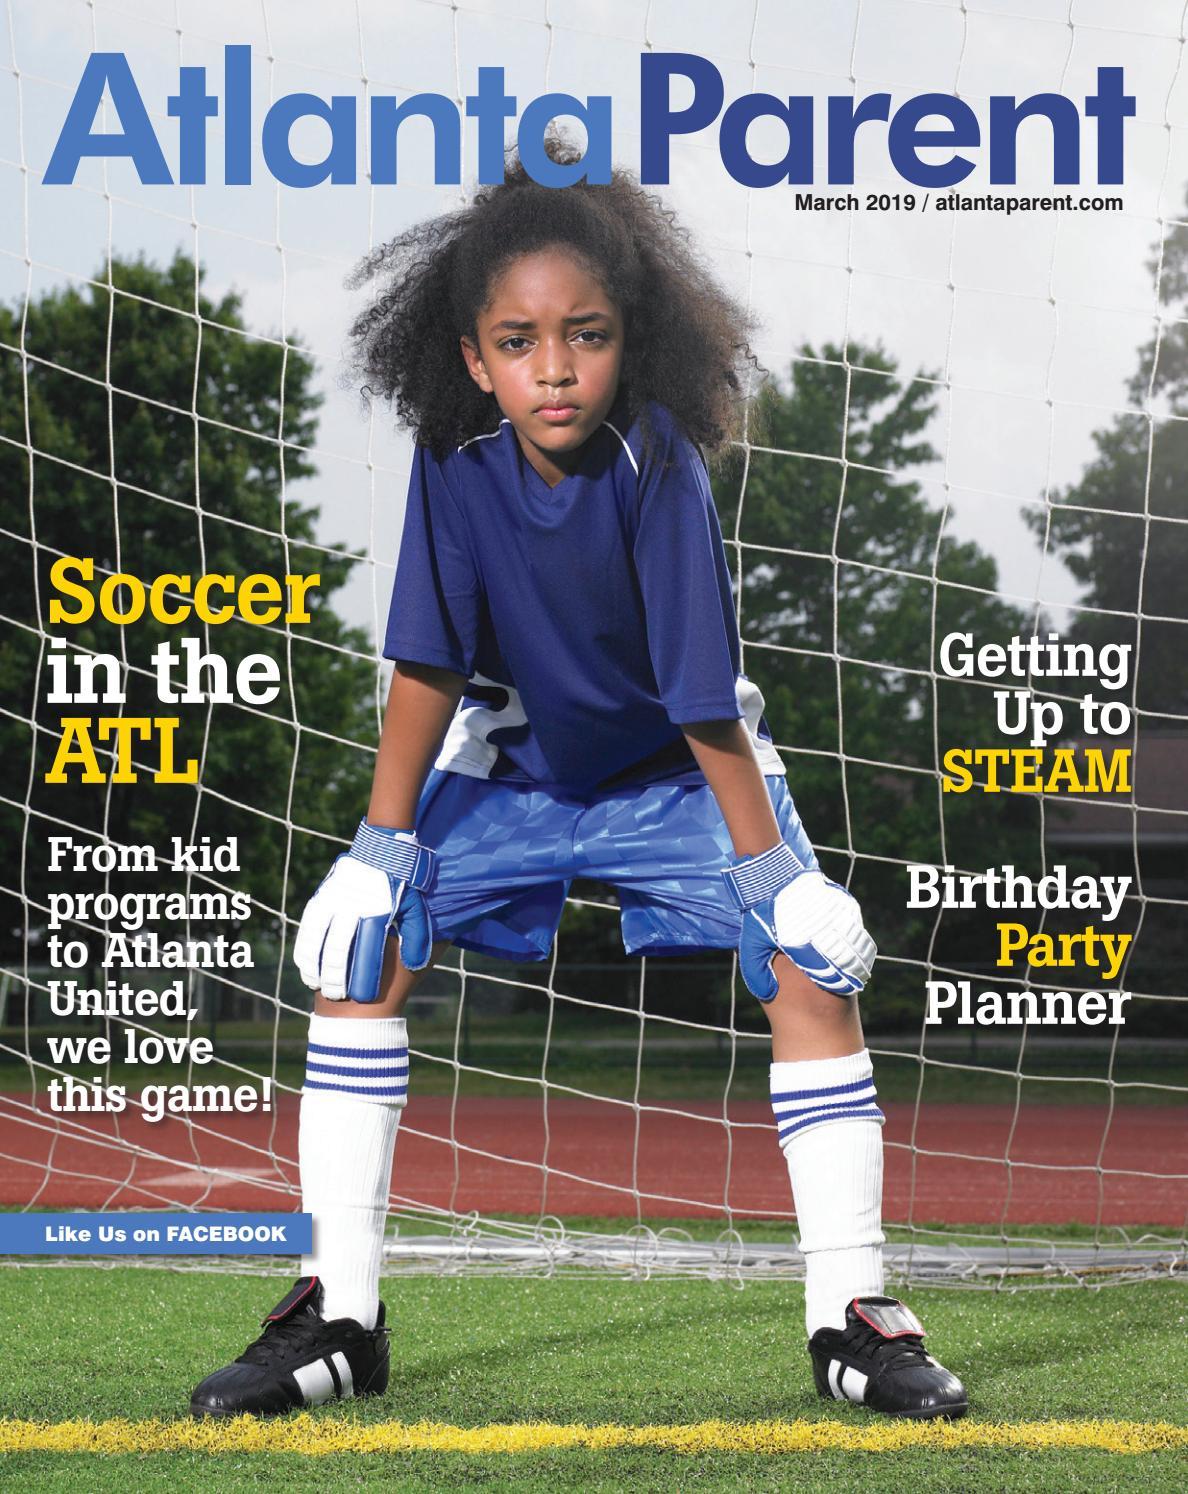 Atlanta Parent March 2019 by Atlanta Parent - issuu 773449548